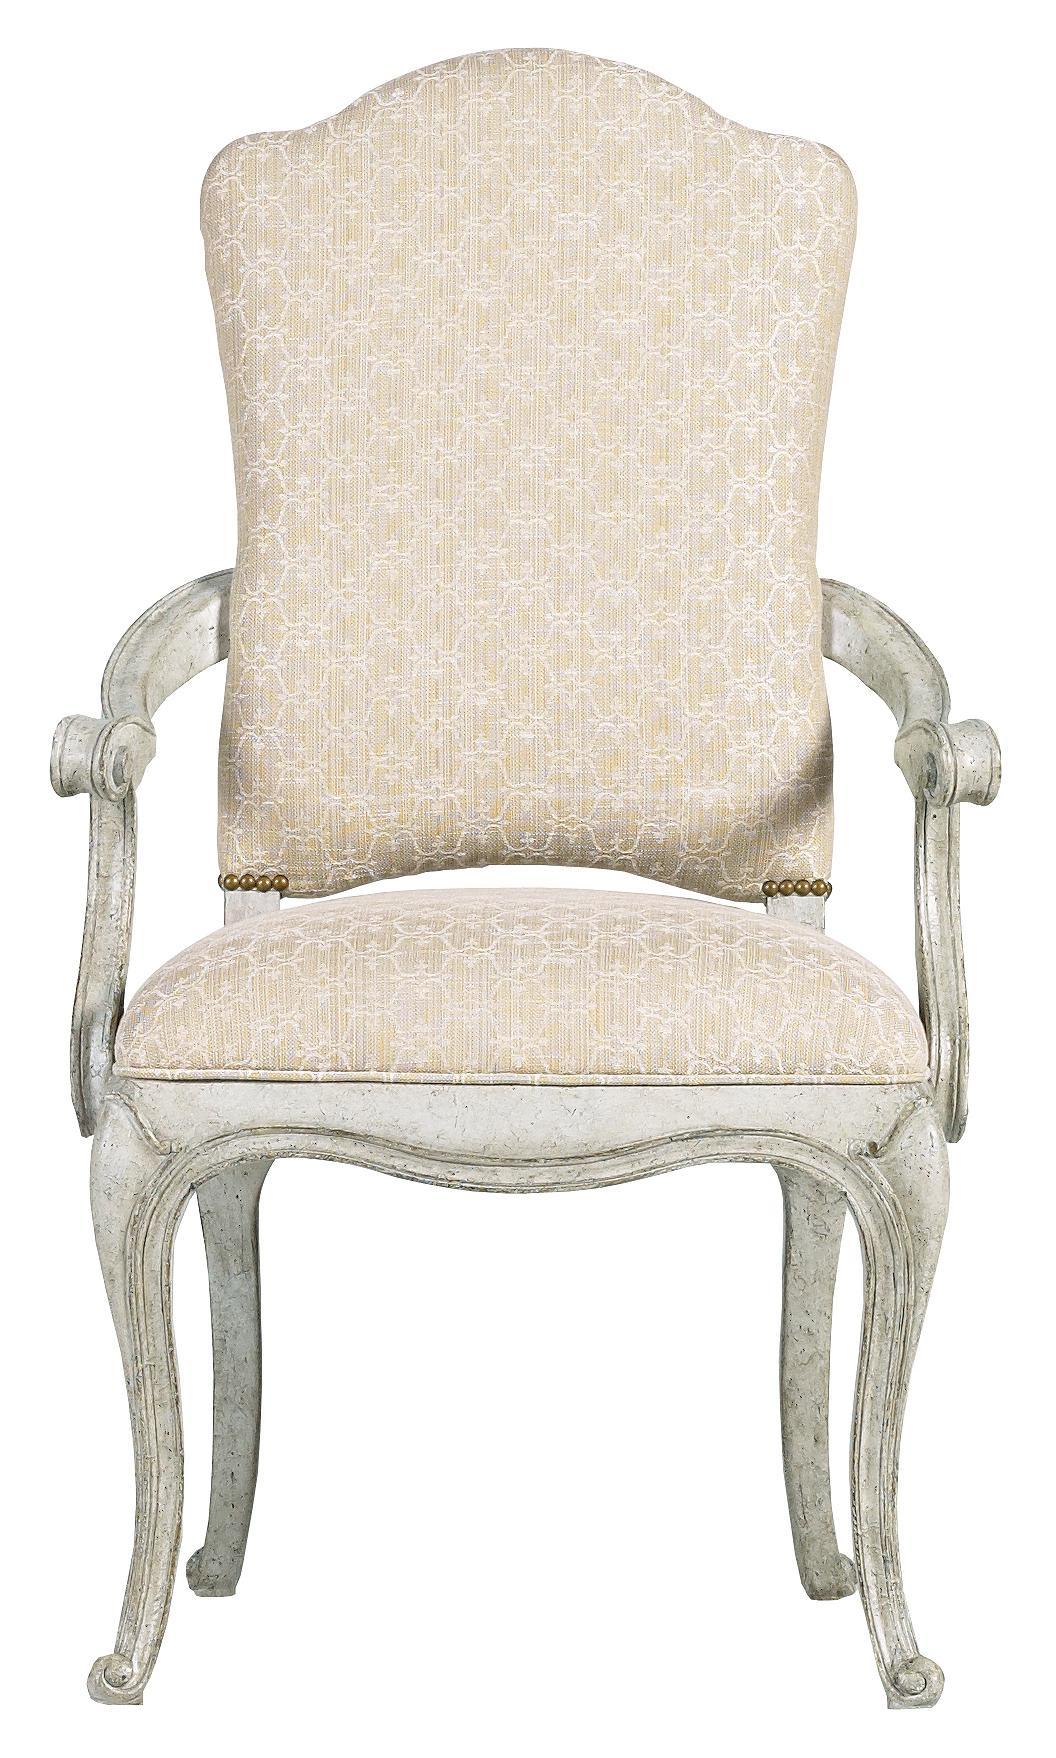 Stanley Furniture Arrondissement Volute Arm Chair - Item Number: 222-21-75